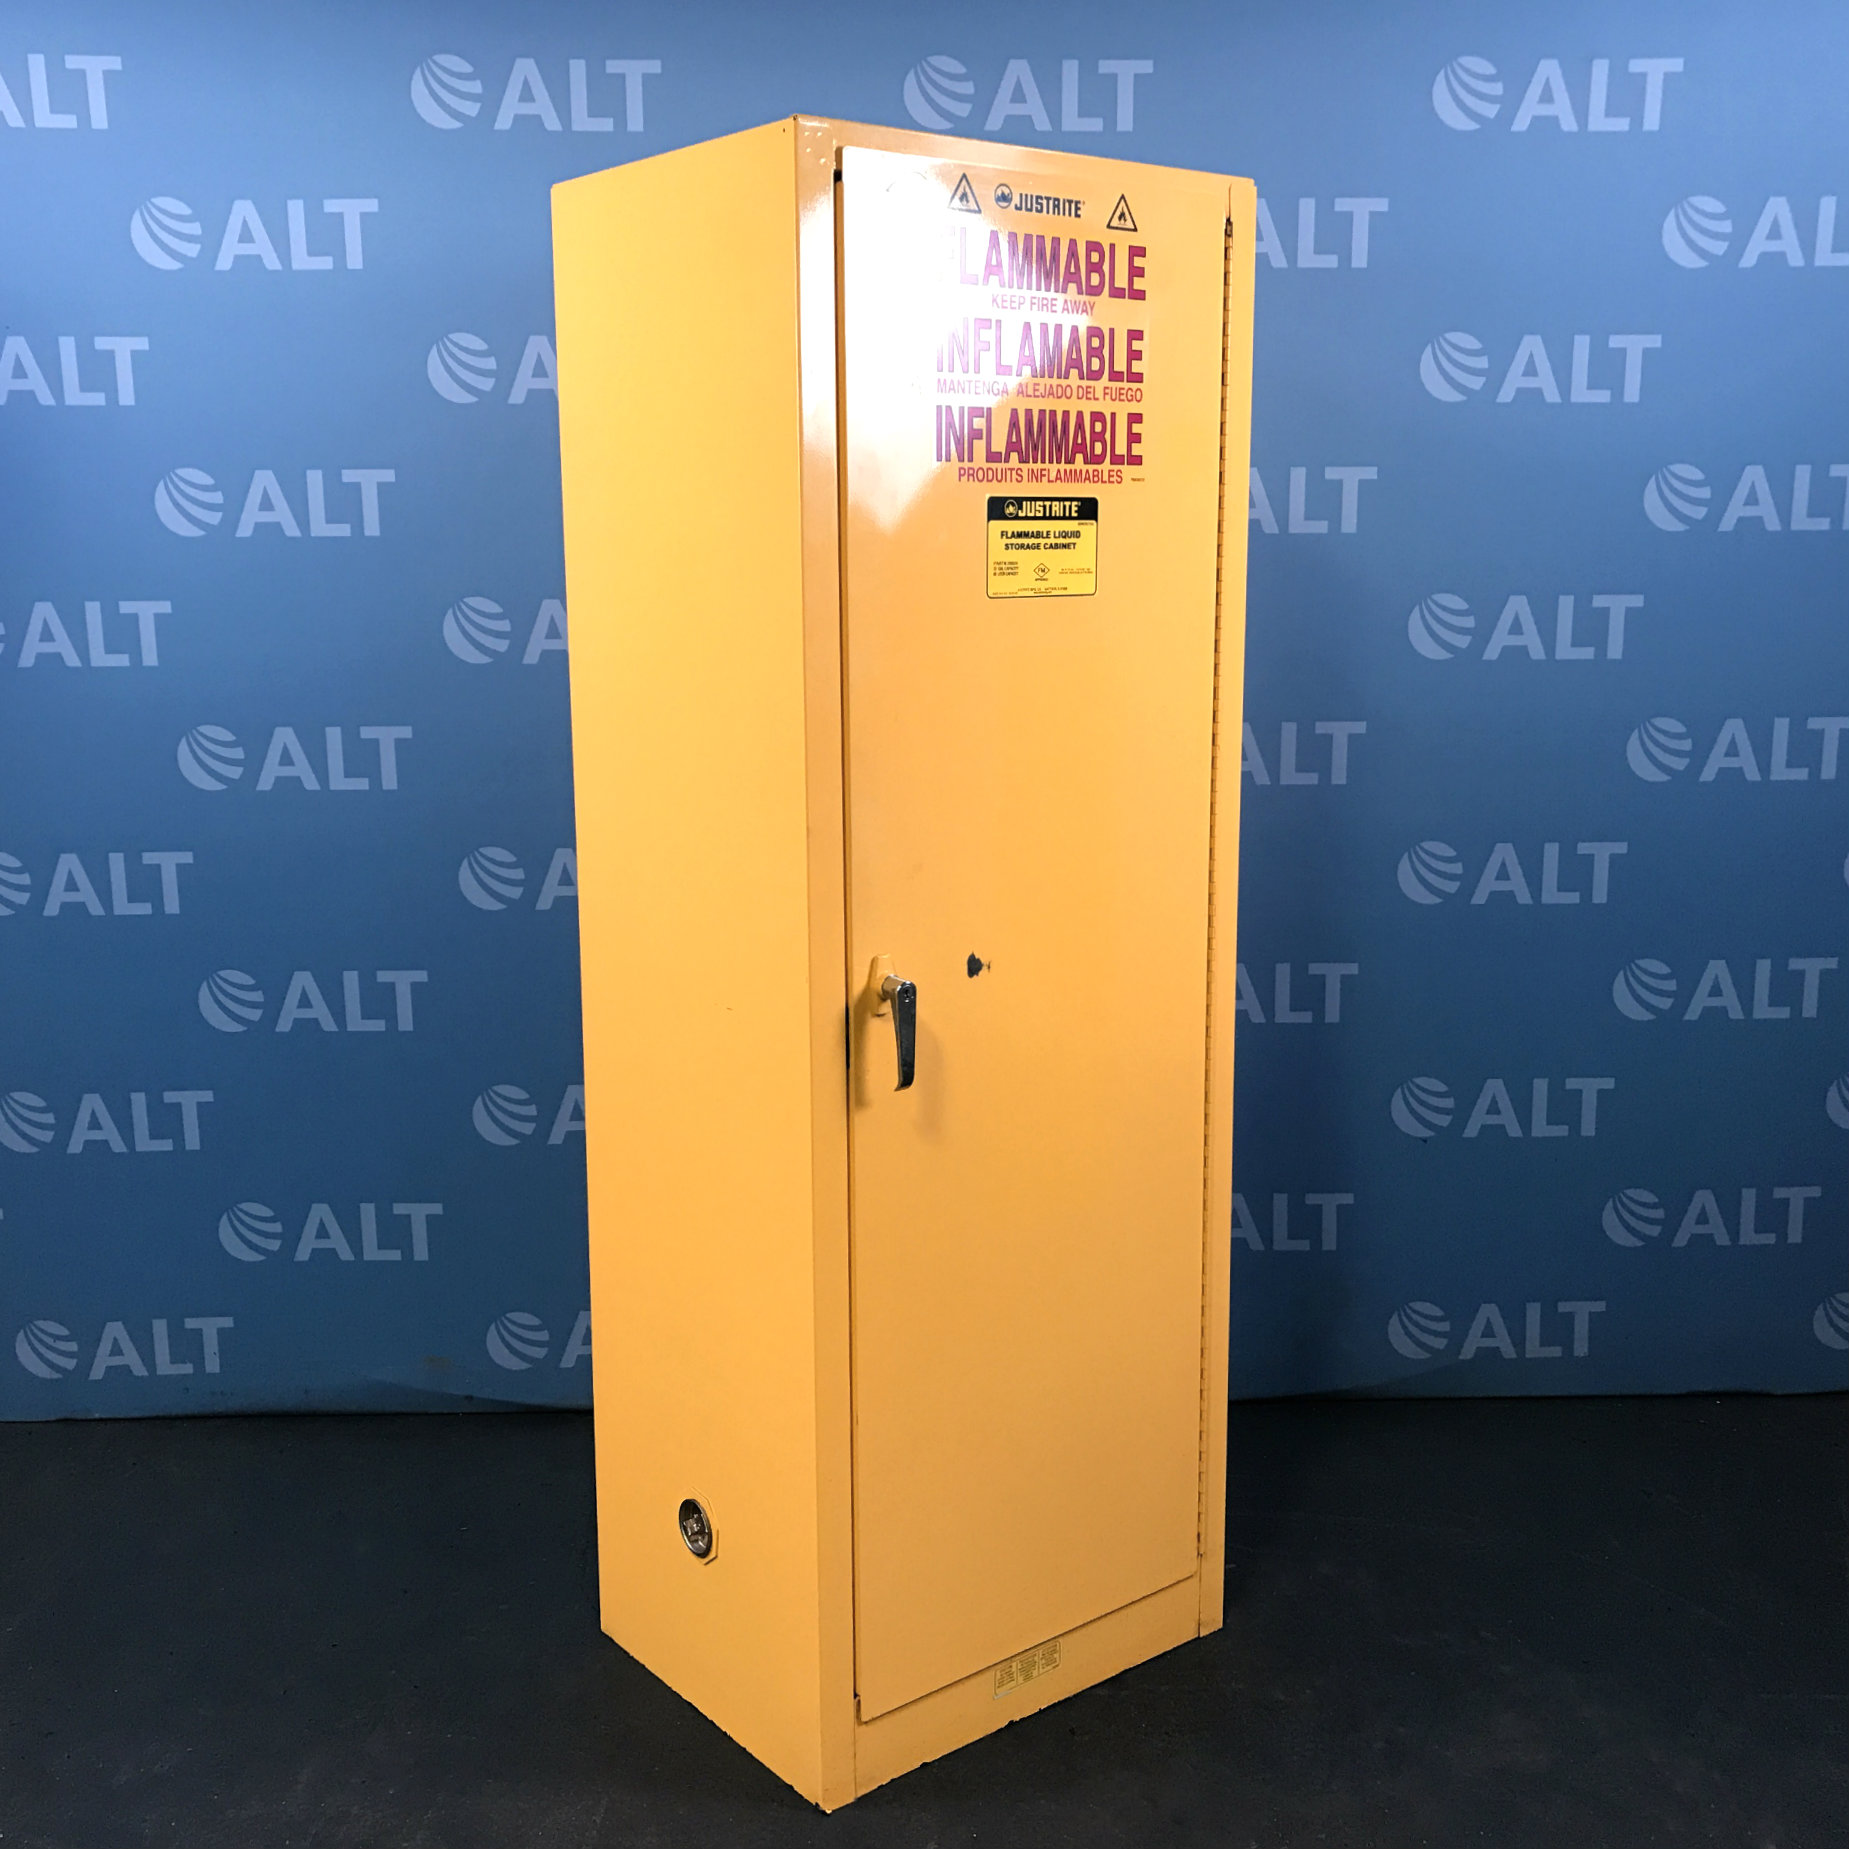 Justrite Model 25824 Flammable Liquid Storage Cabinet 22 Gal Image